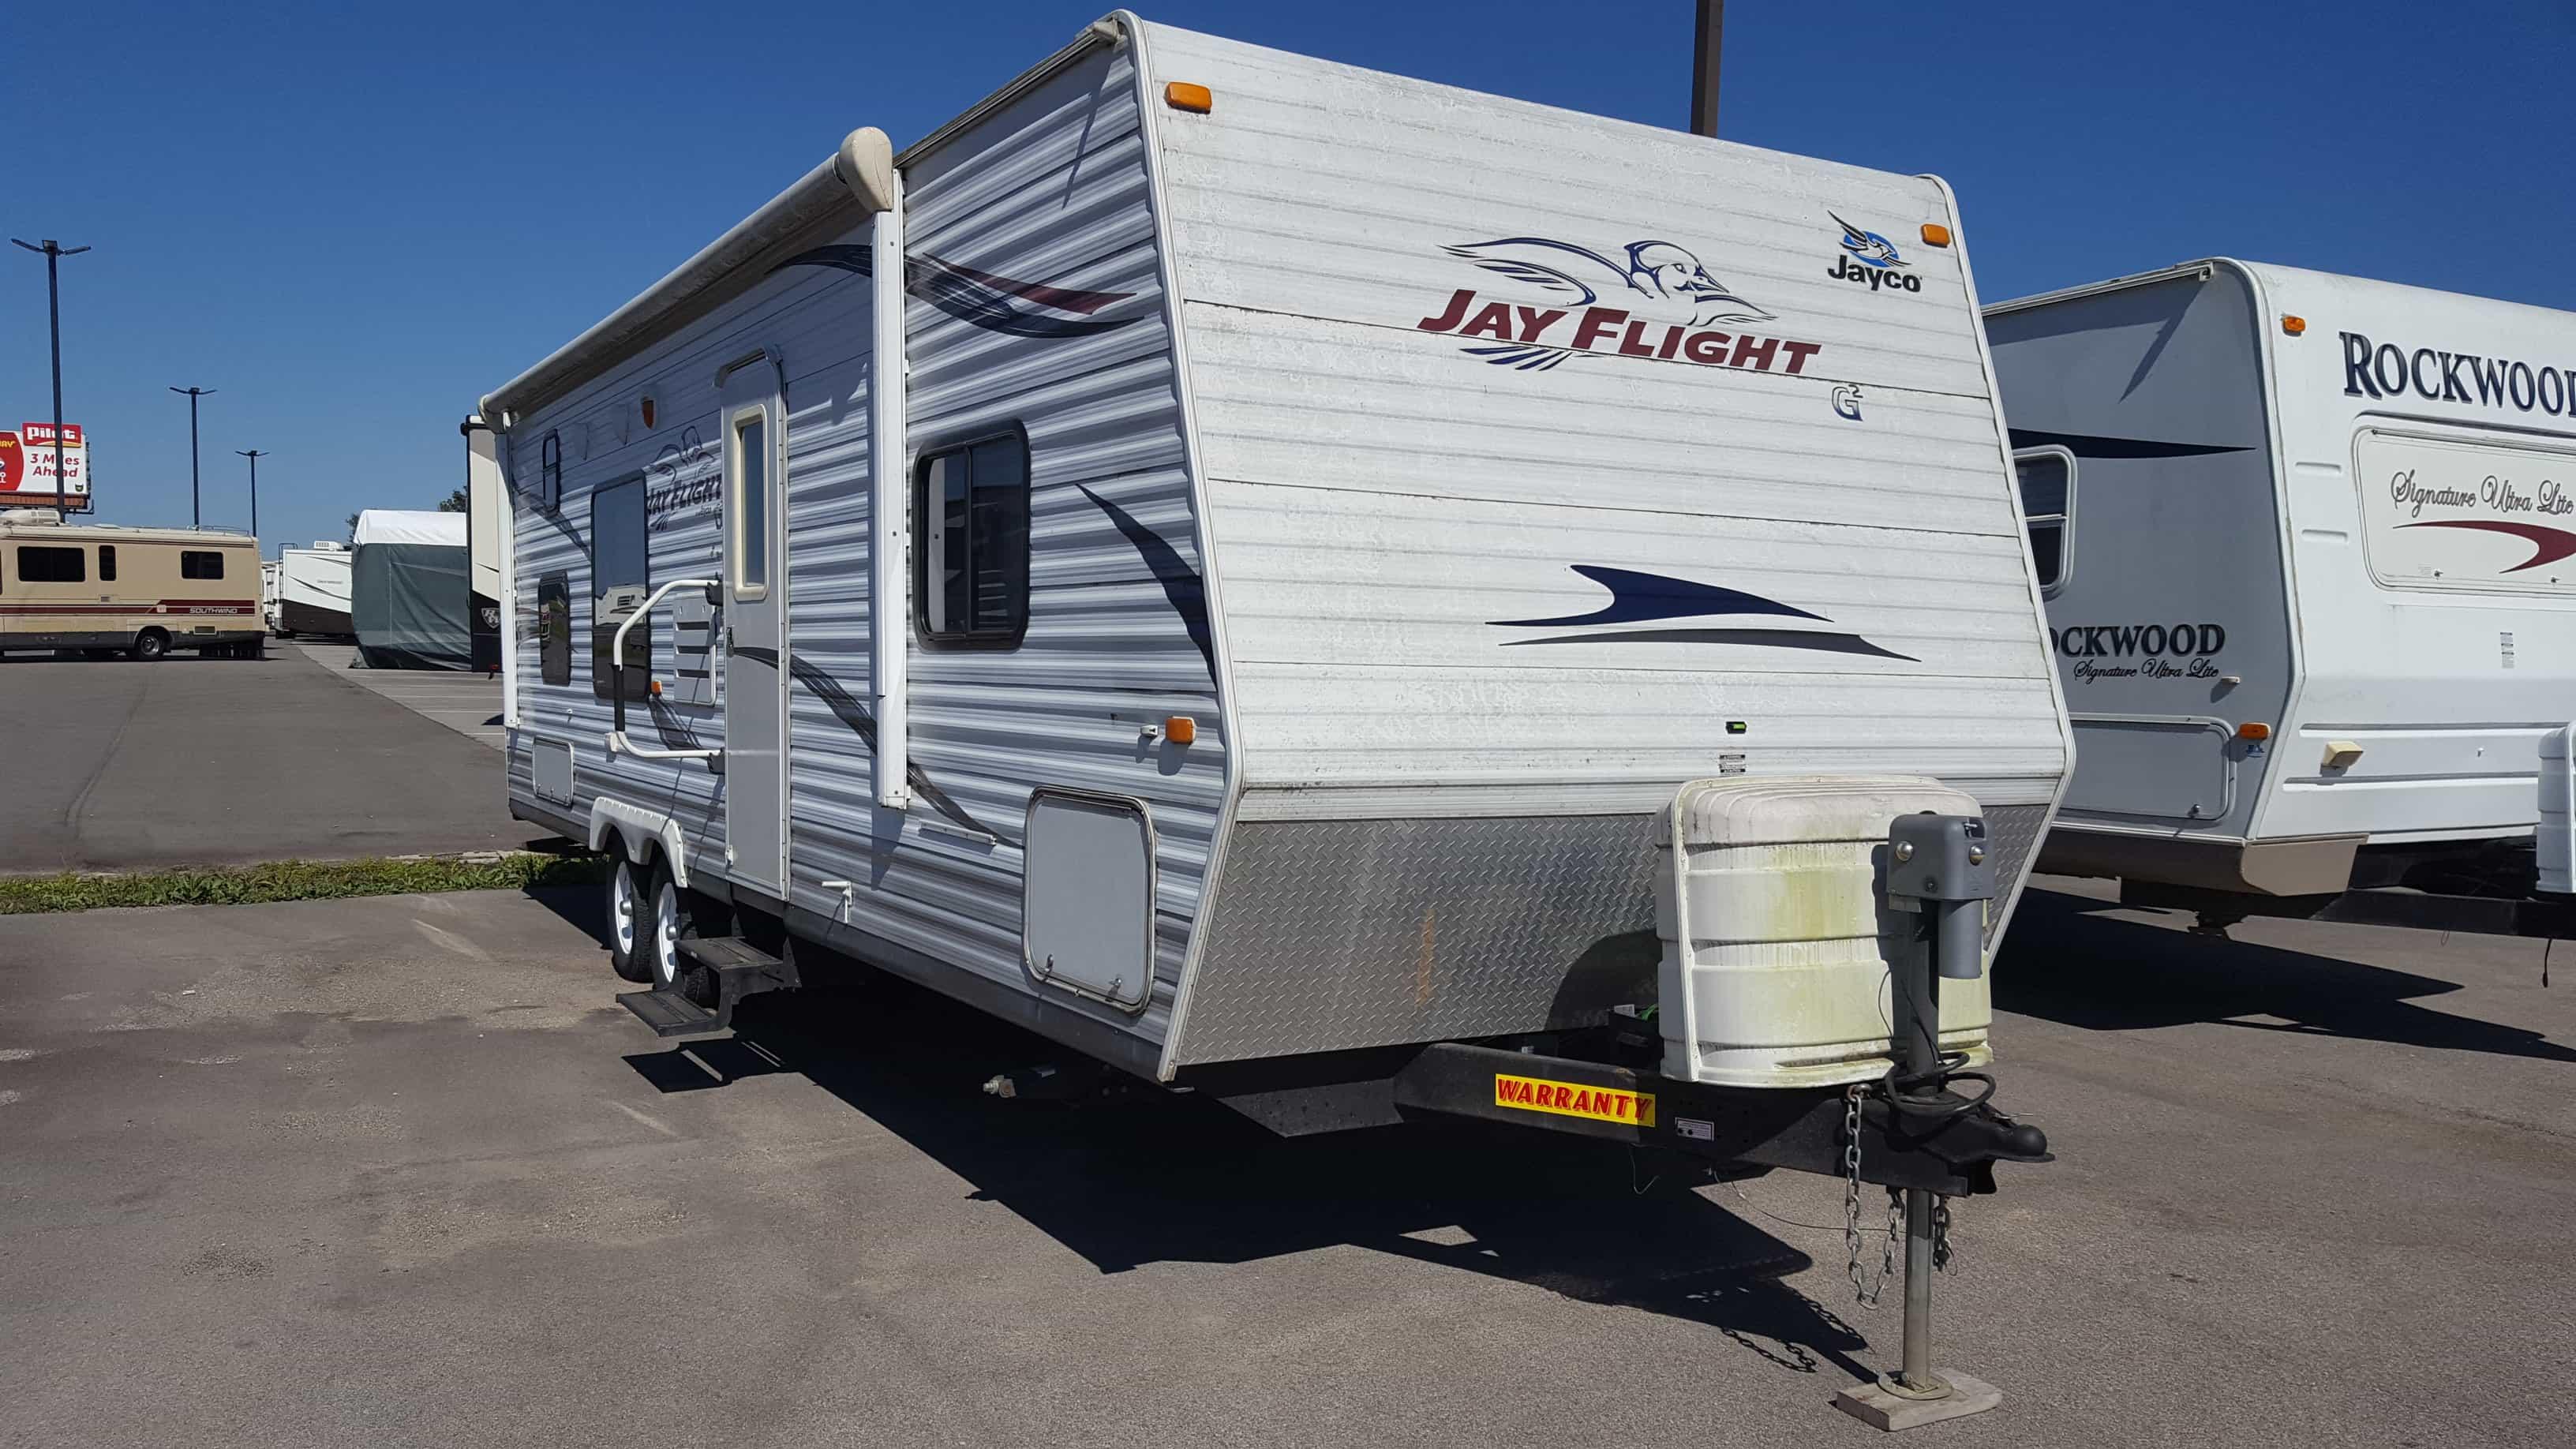 USED 2010 Jayco JAY FLIGHT 29 BHS - American RV